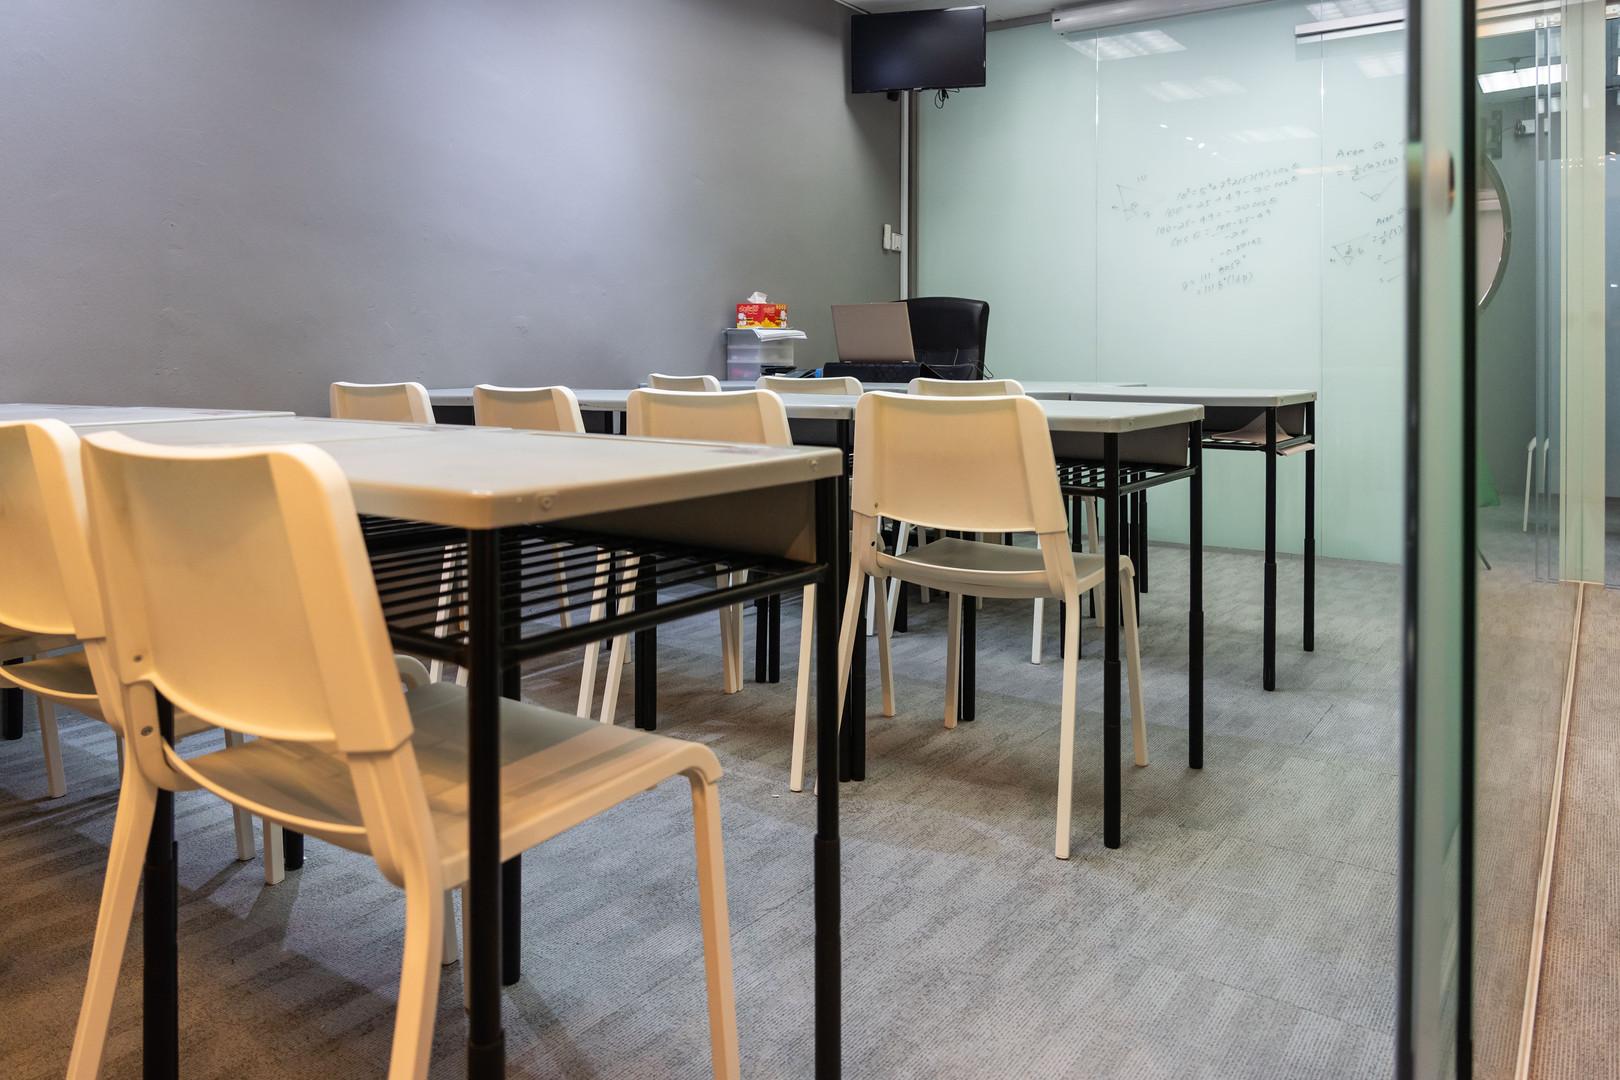 Classrooms at Math Academia